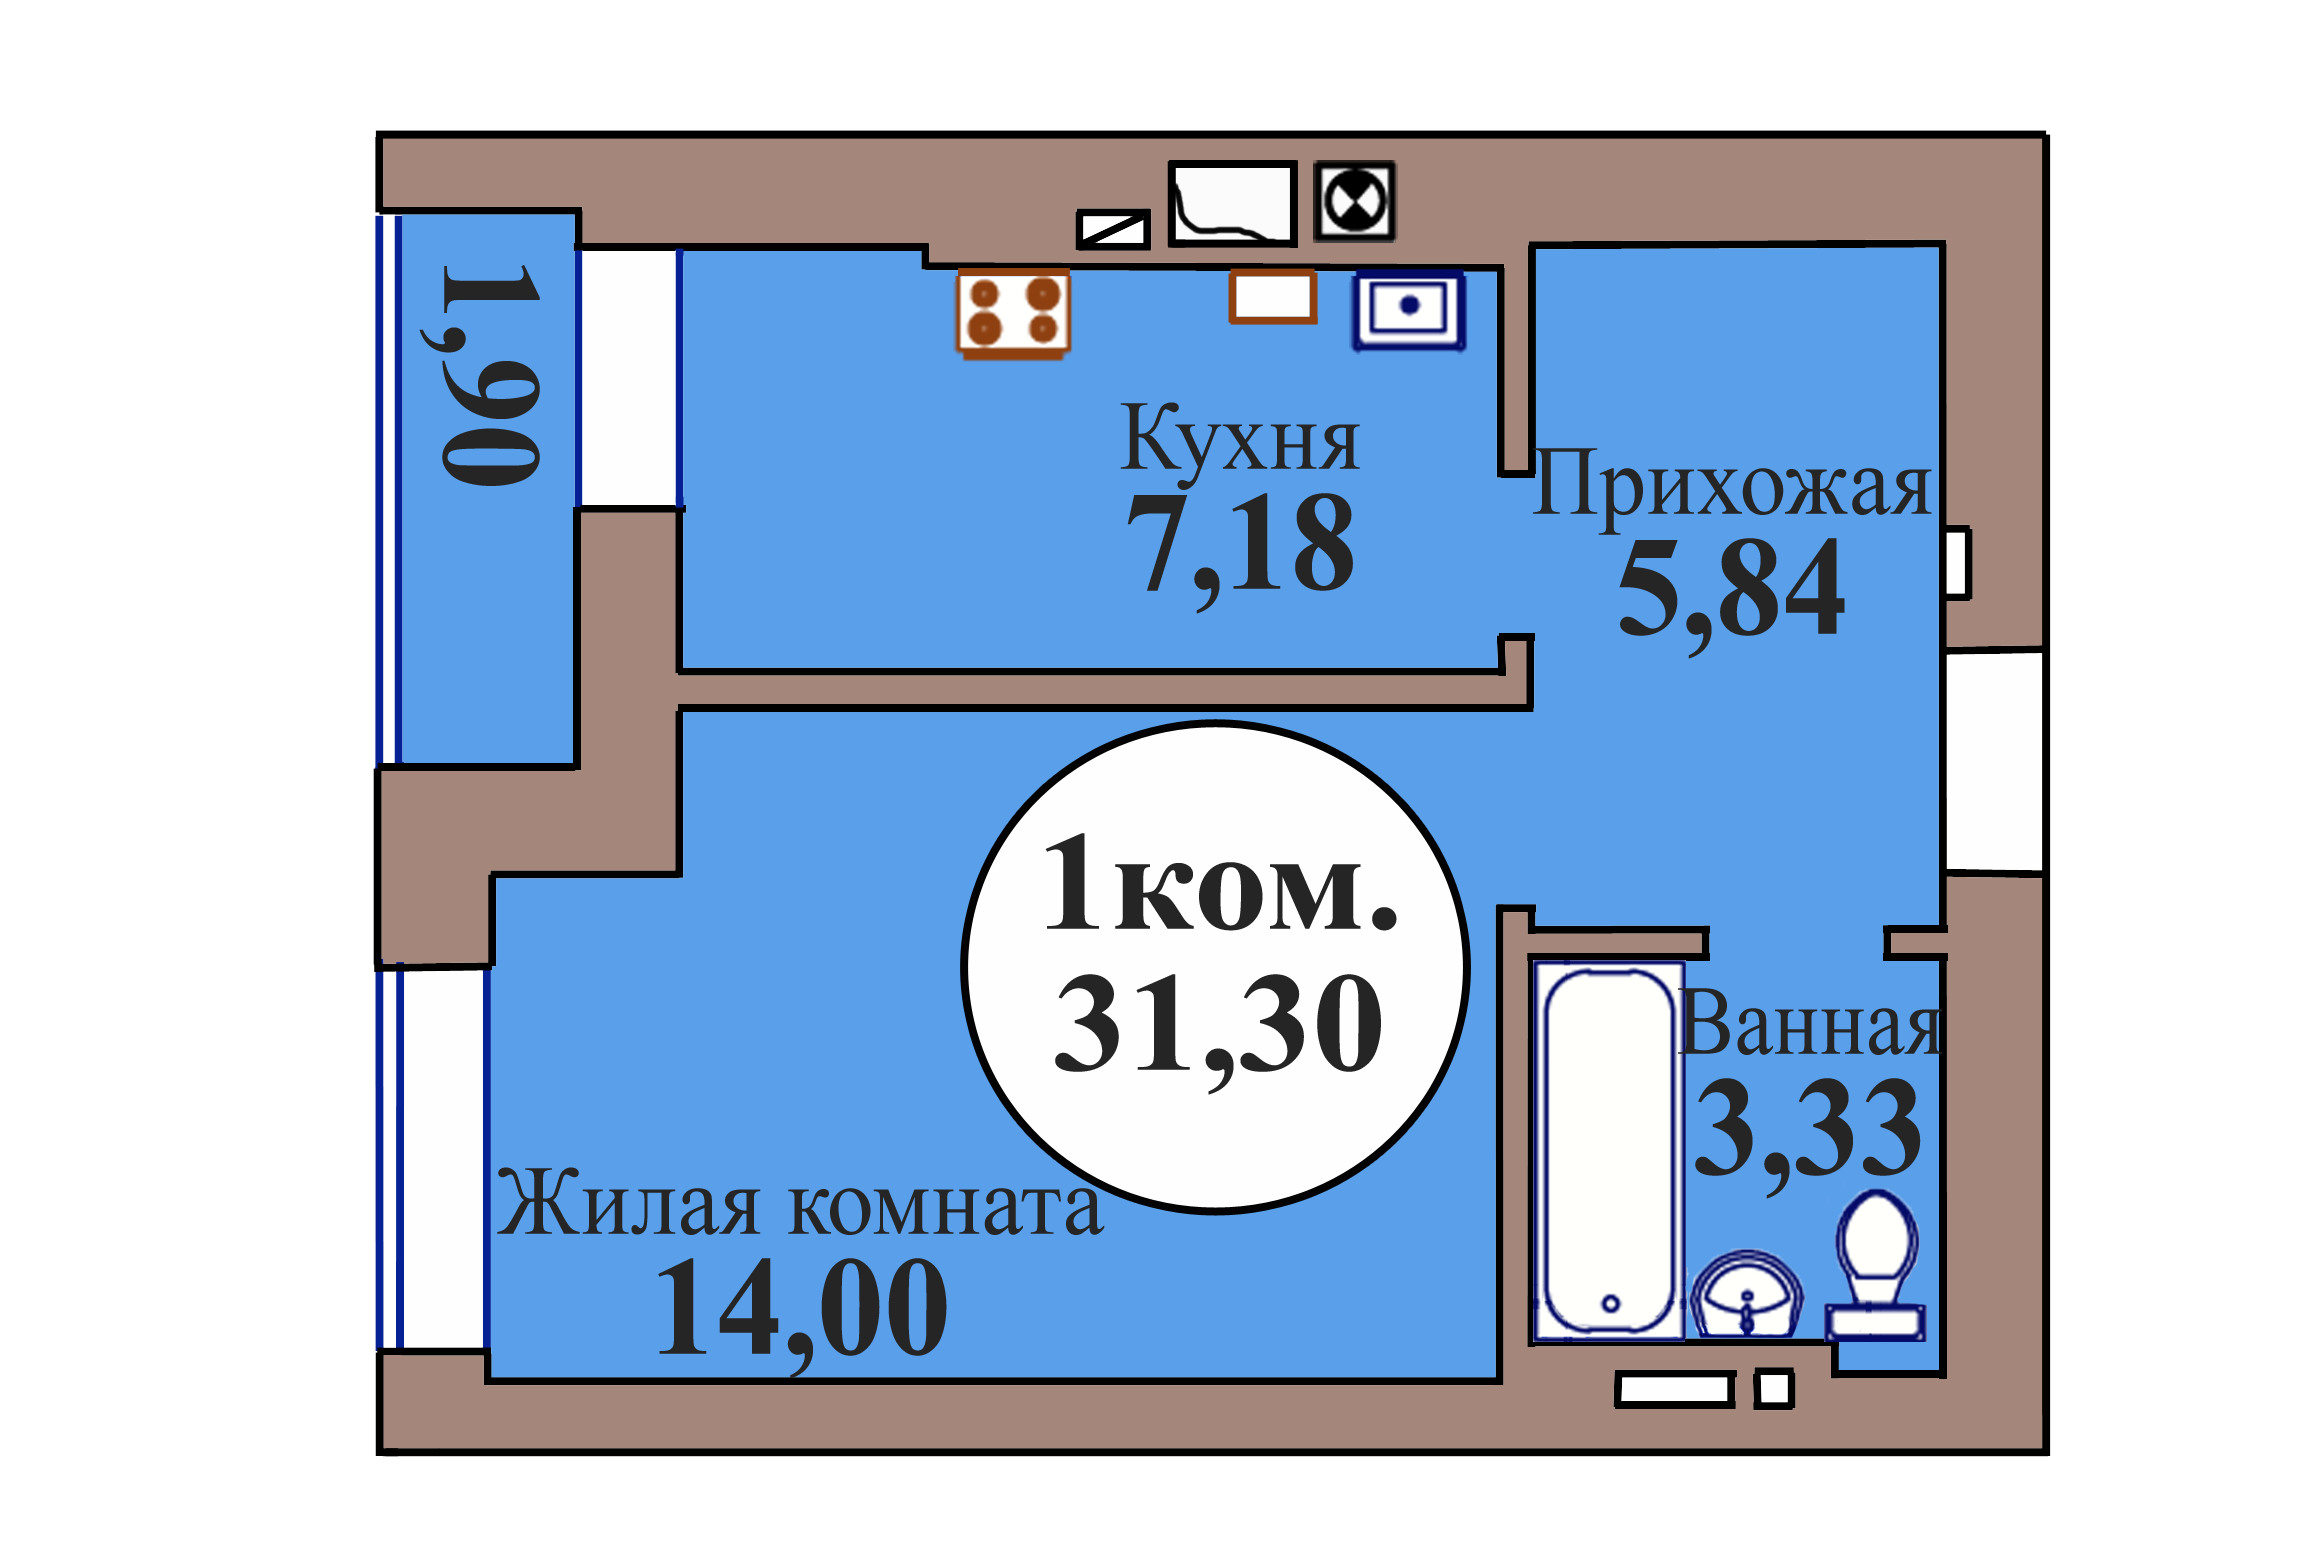 1-комн. кв. по пер. Калининградский, 5 кв. 52 в Калининграде